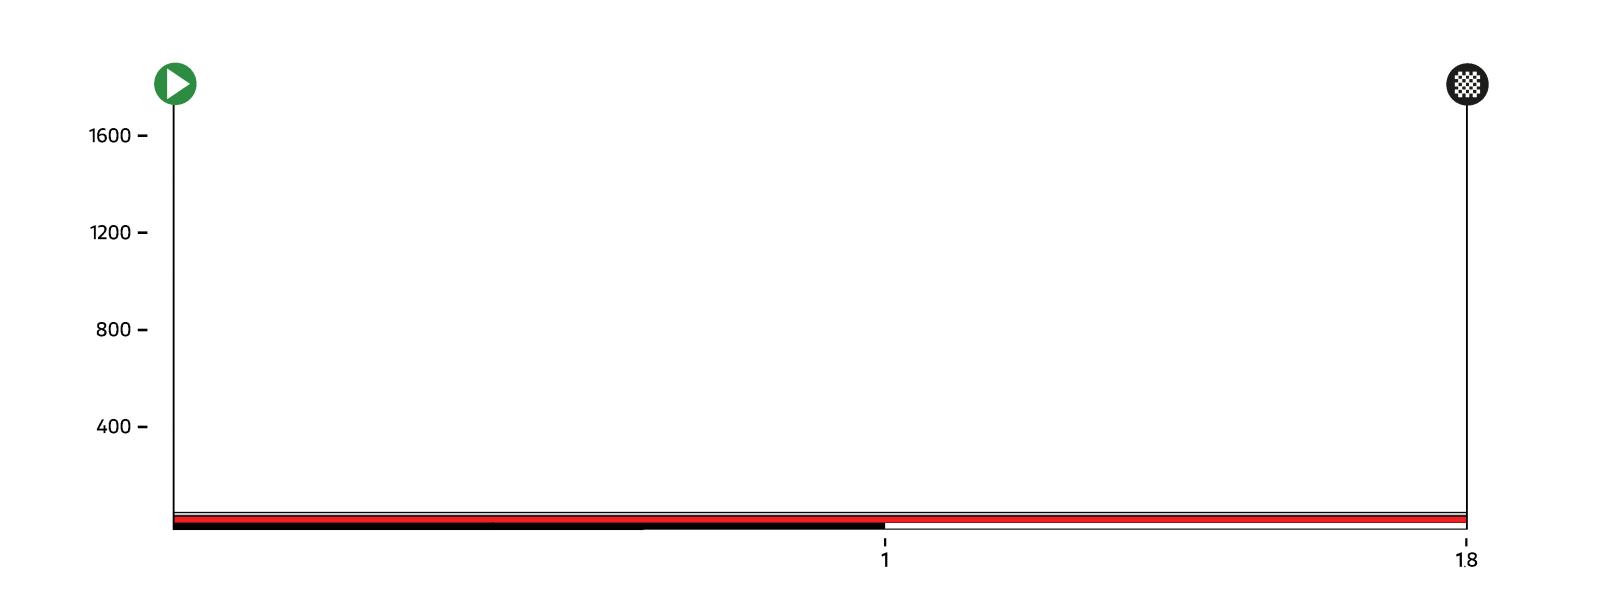 [Immagine: prologo-altimetria-1600-1.png?anchor=cen...width=1084]